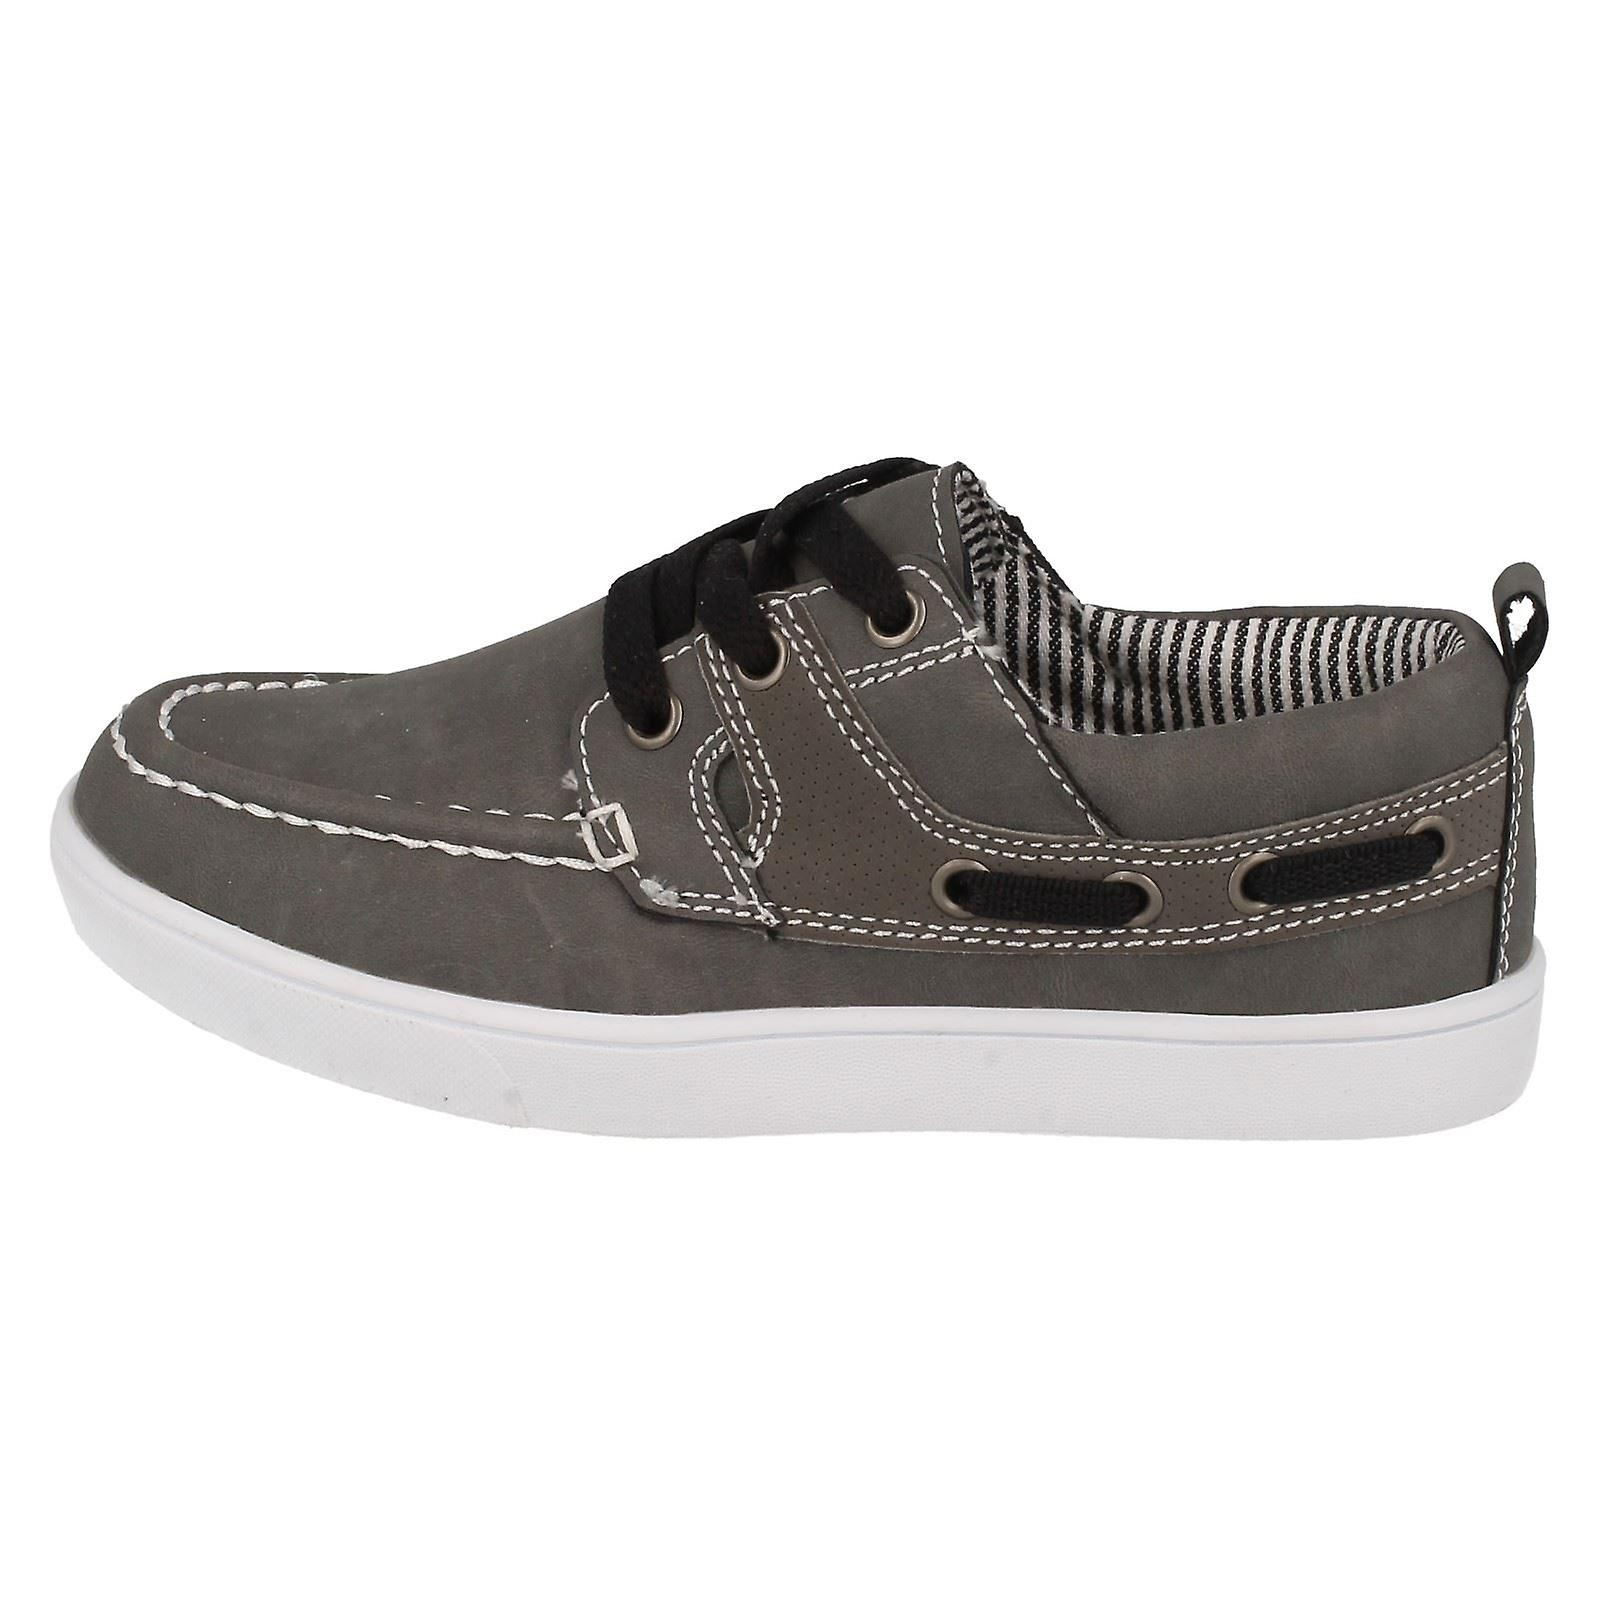 Chicos JCDees Casual verano zapatos N1090